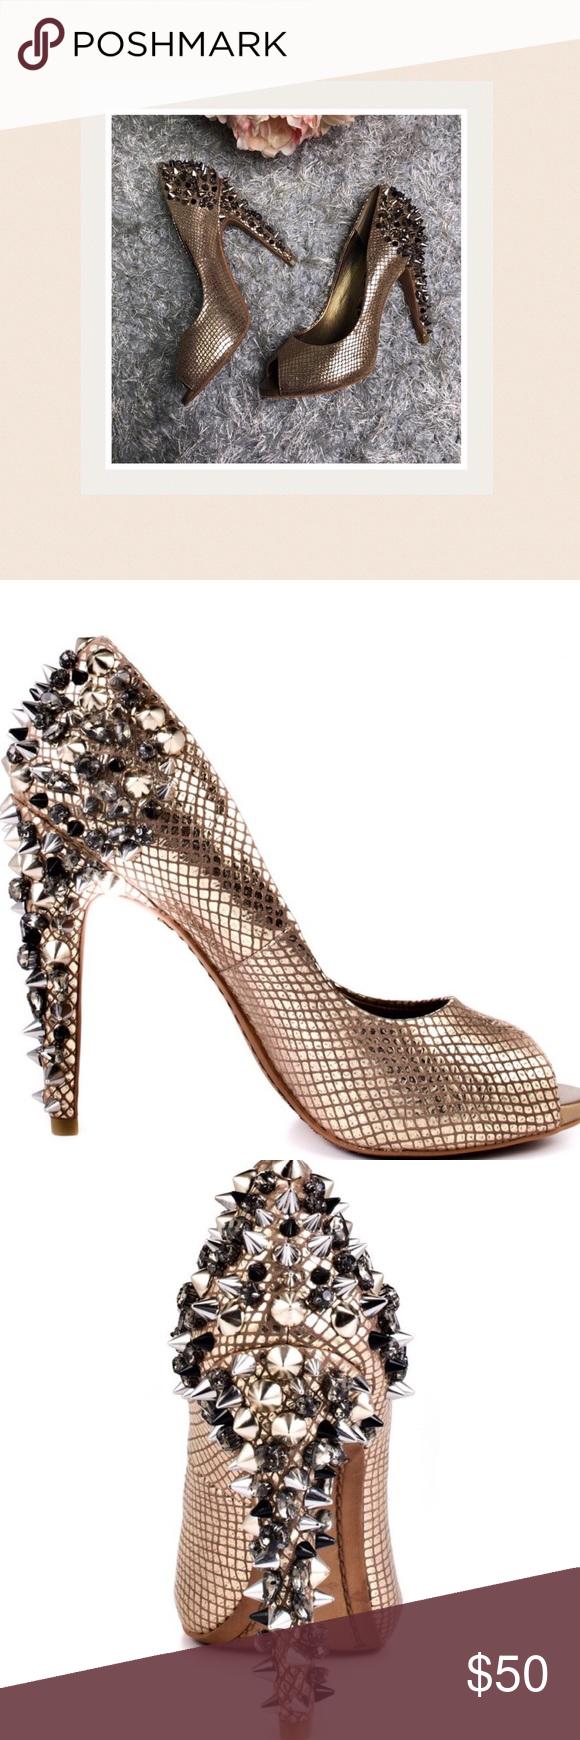 50136c971008 Sam Edelman Larissa Spiked Peep Toe Pump Excellent Used Condition Sam  Edelman Shoes Heels